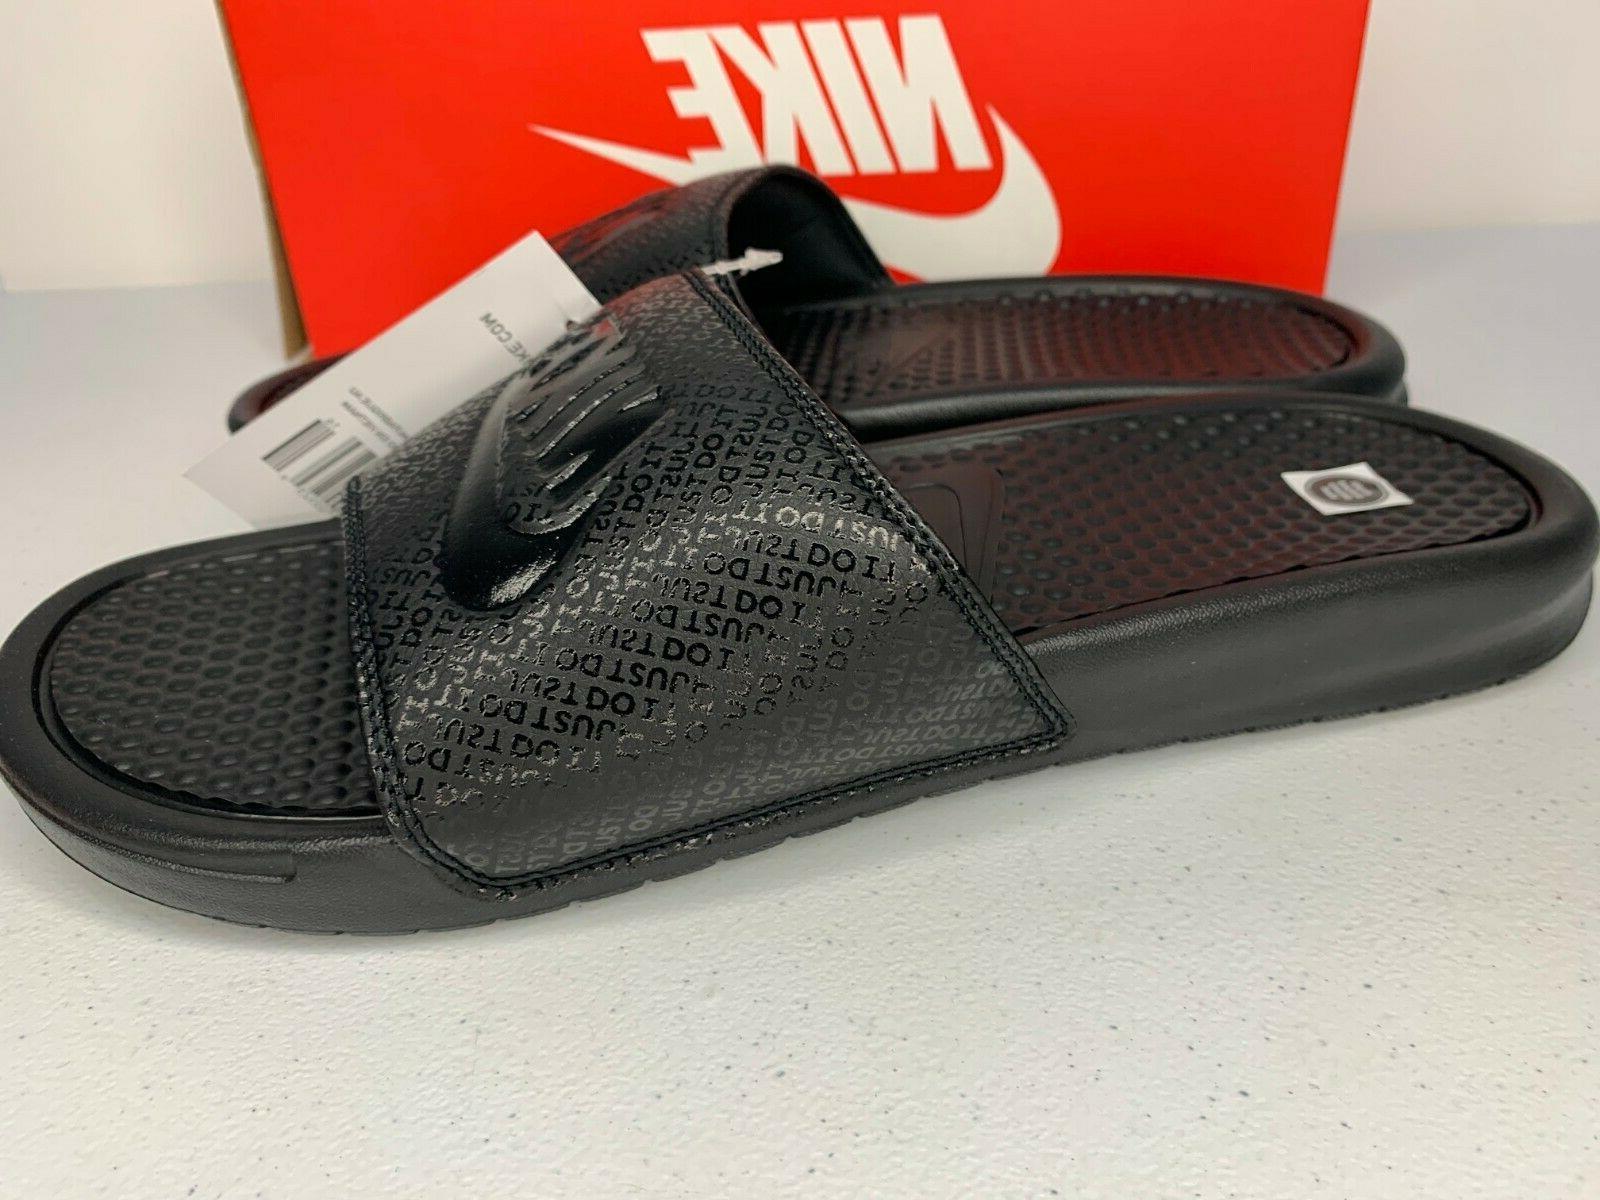 NIB 6-13 Nike Black Slides Sandals Slippers